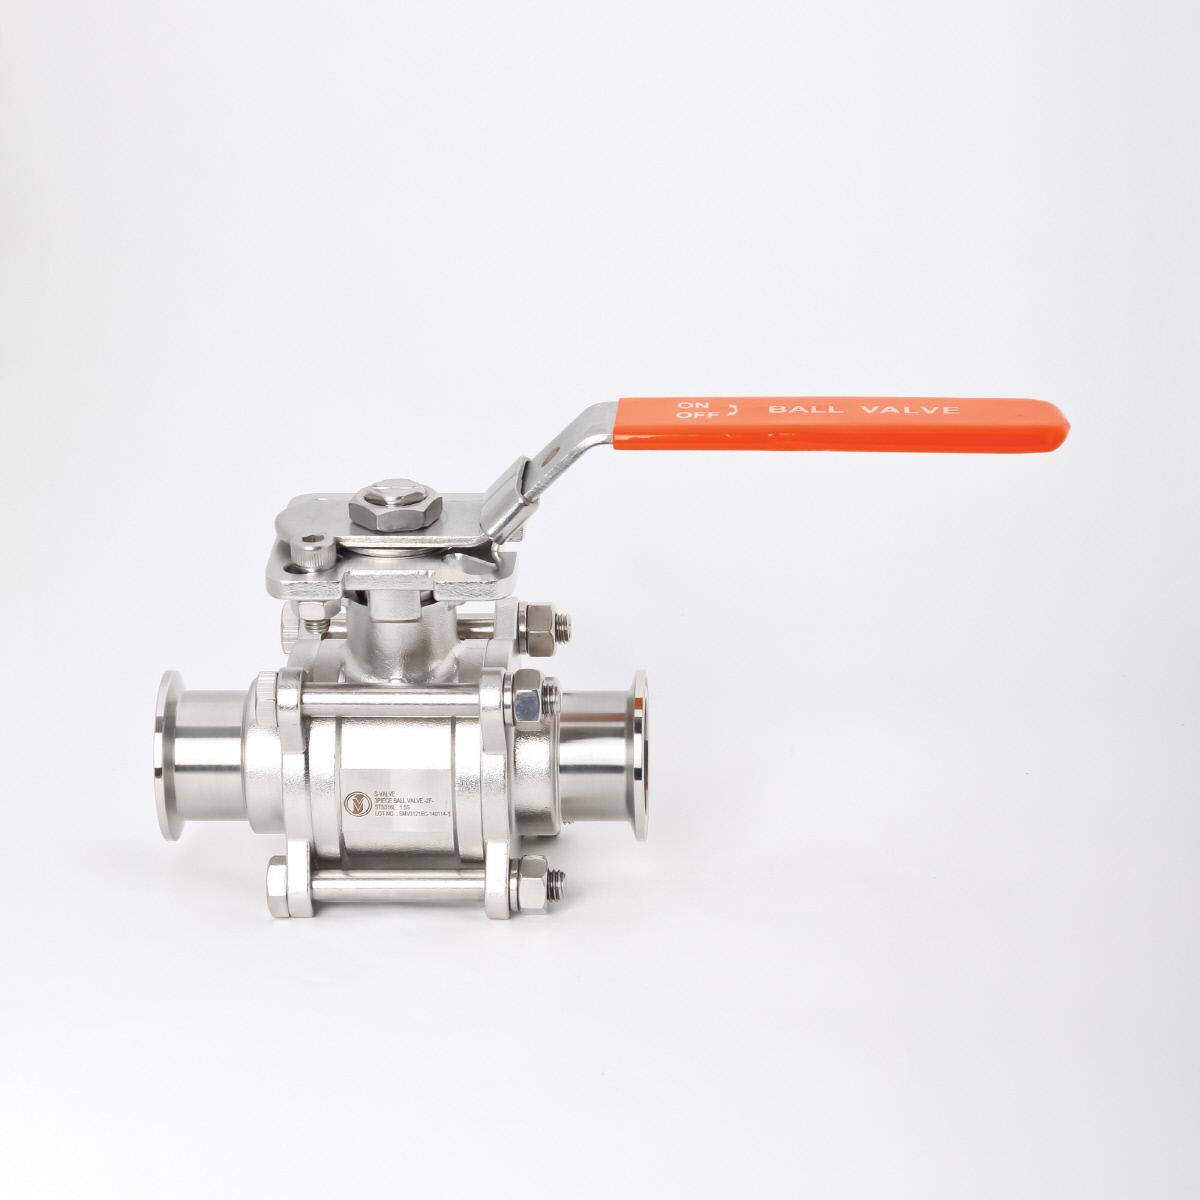 S-valve_0082.jpg